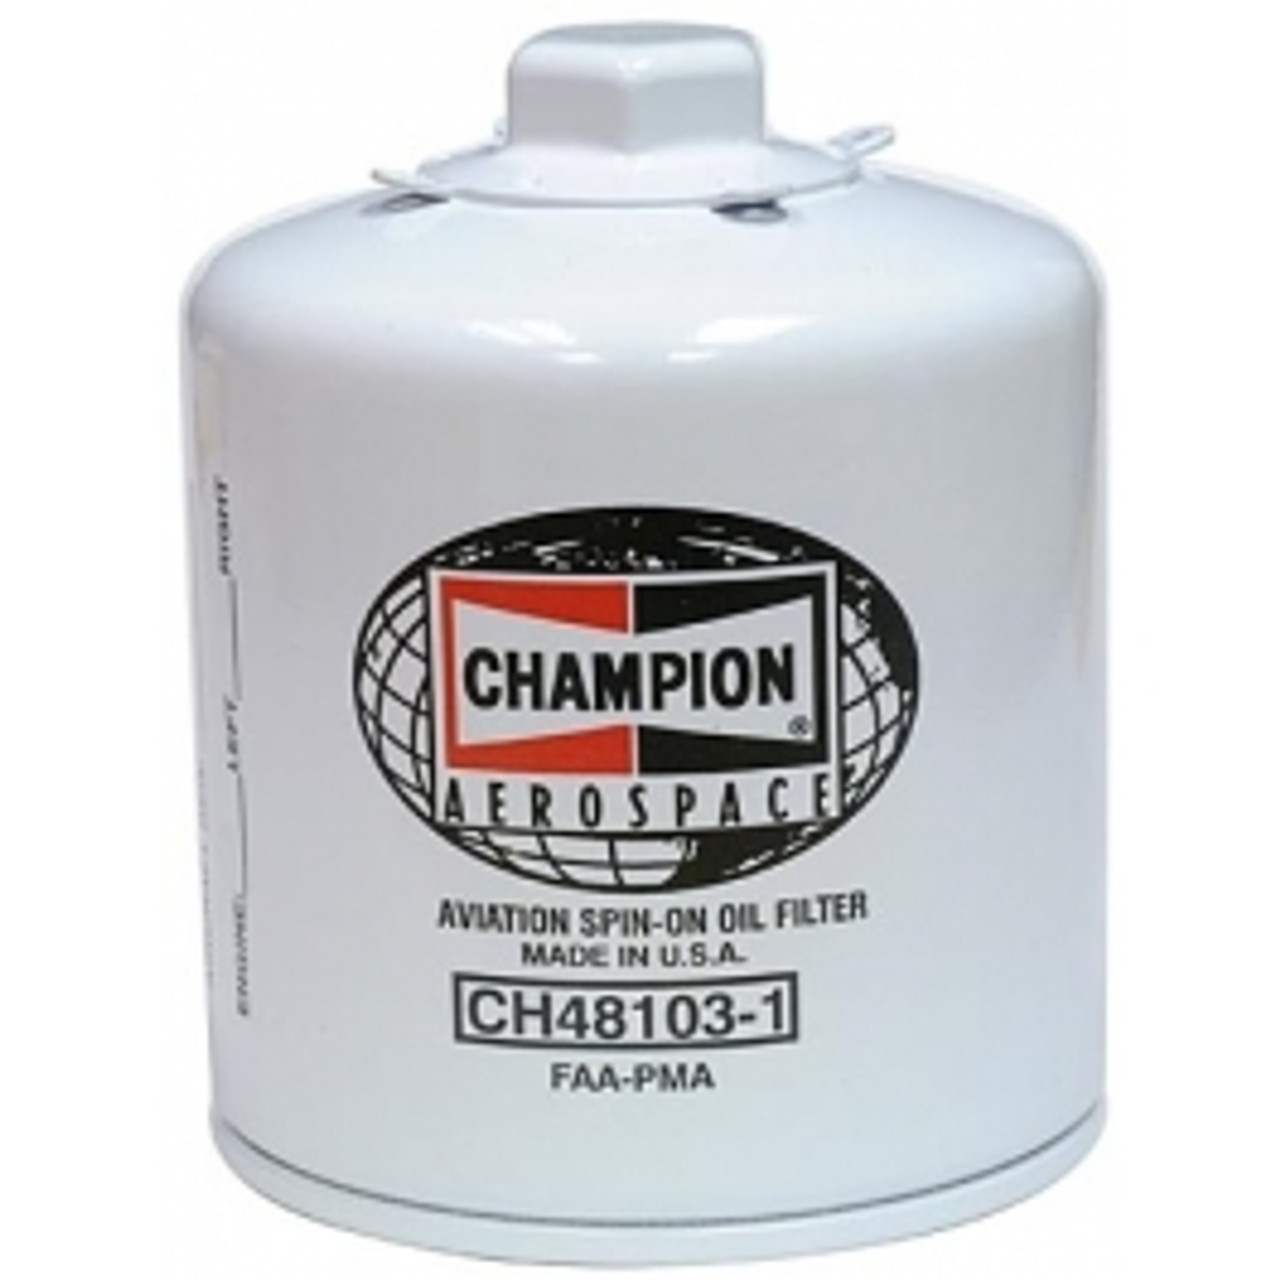 Champion Oil Filter - CH48103